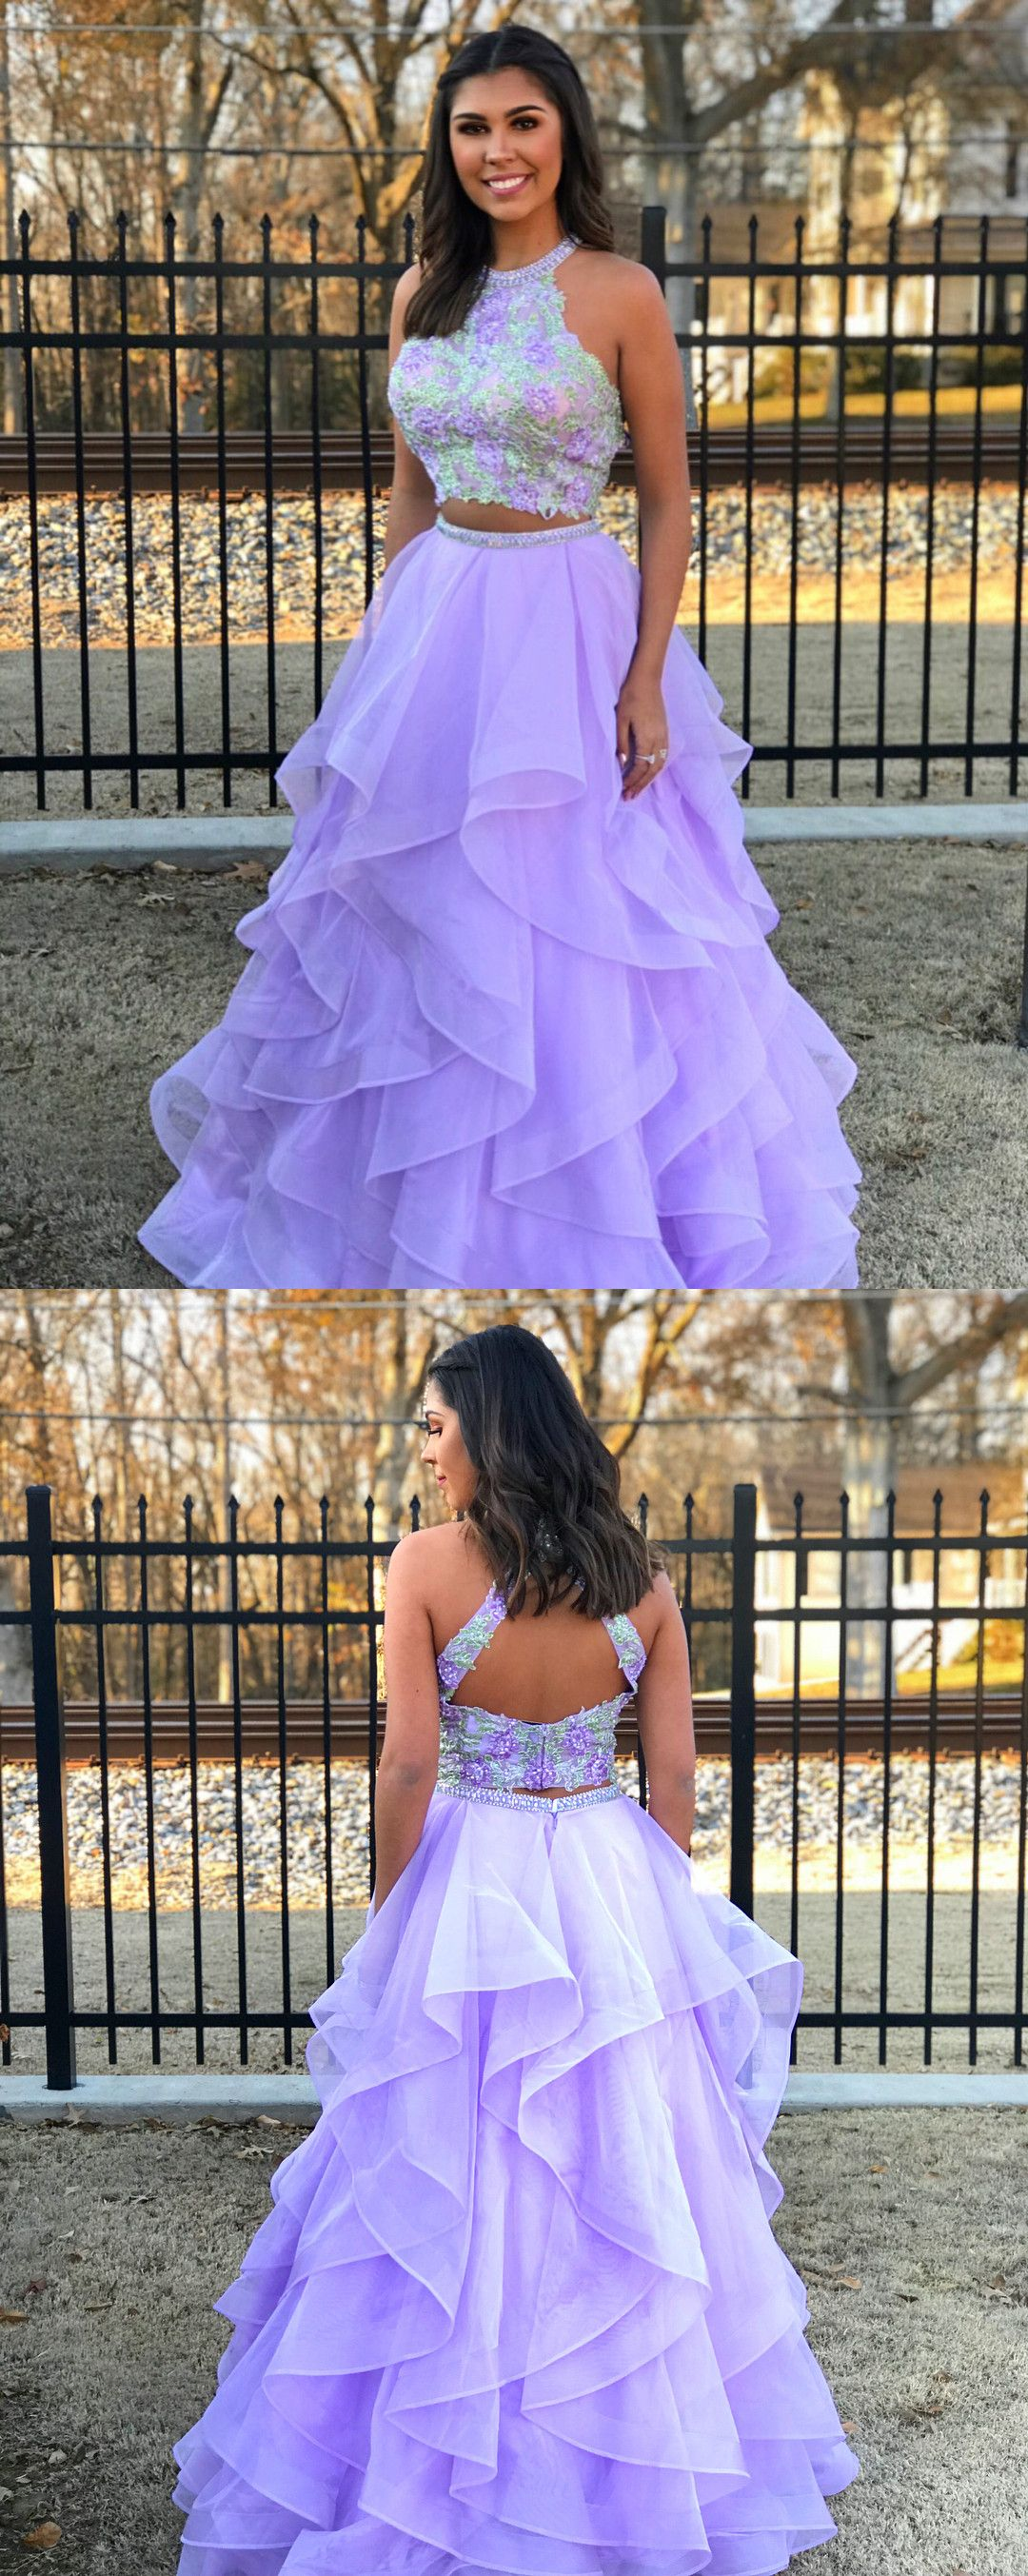 princess prom dresses, two piece prom dresses, lavender prom dresses ...